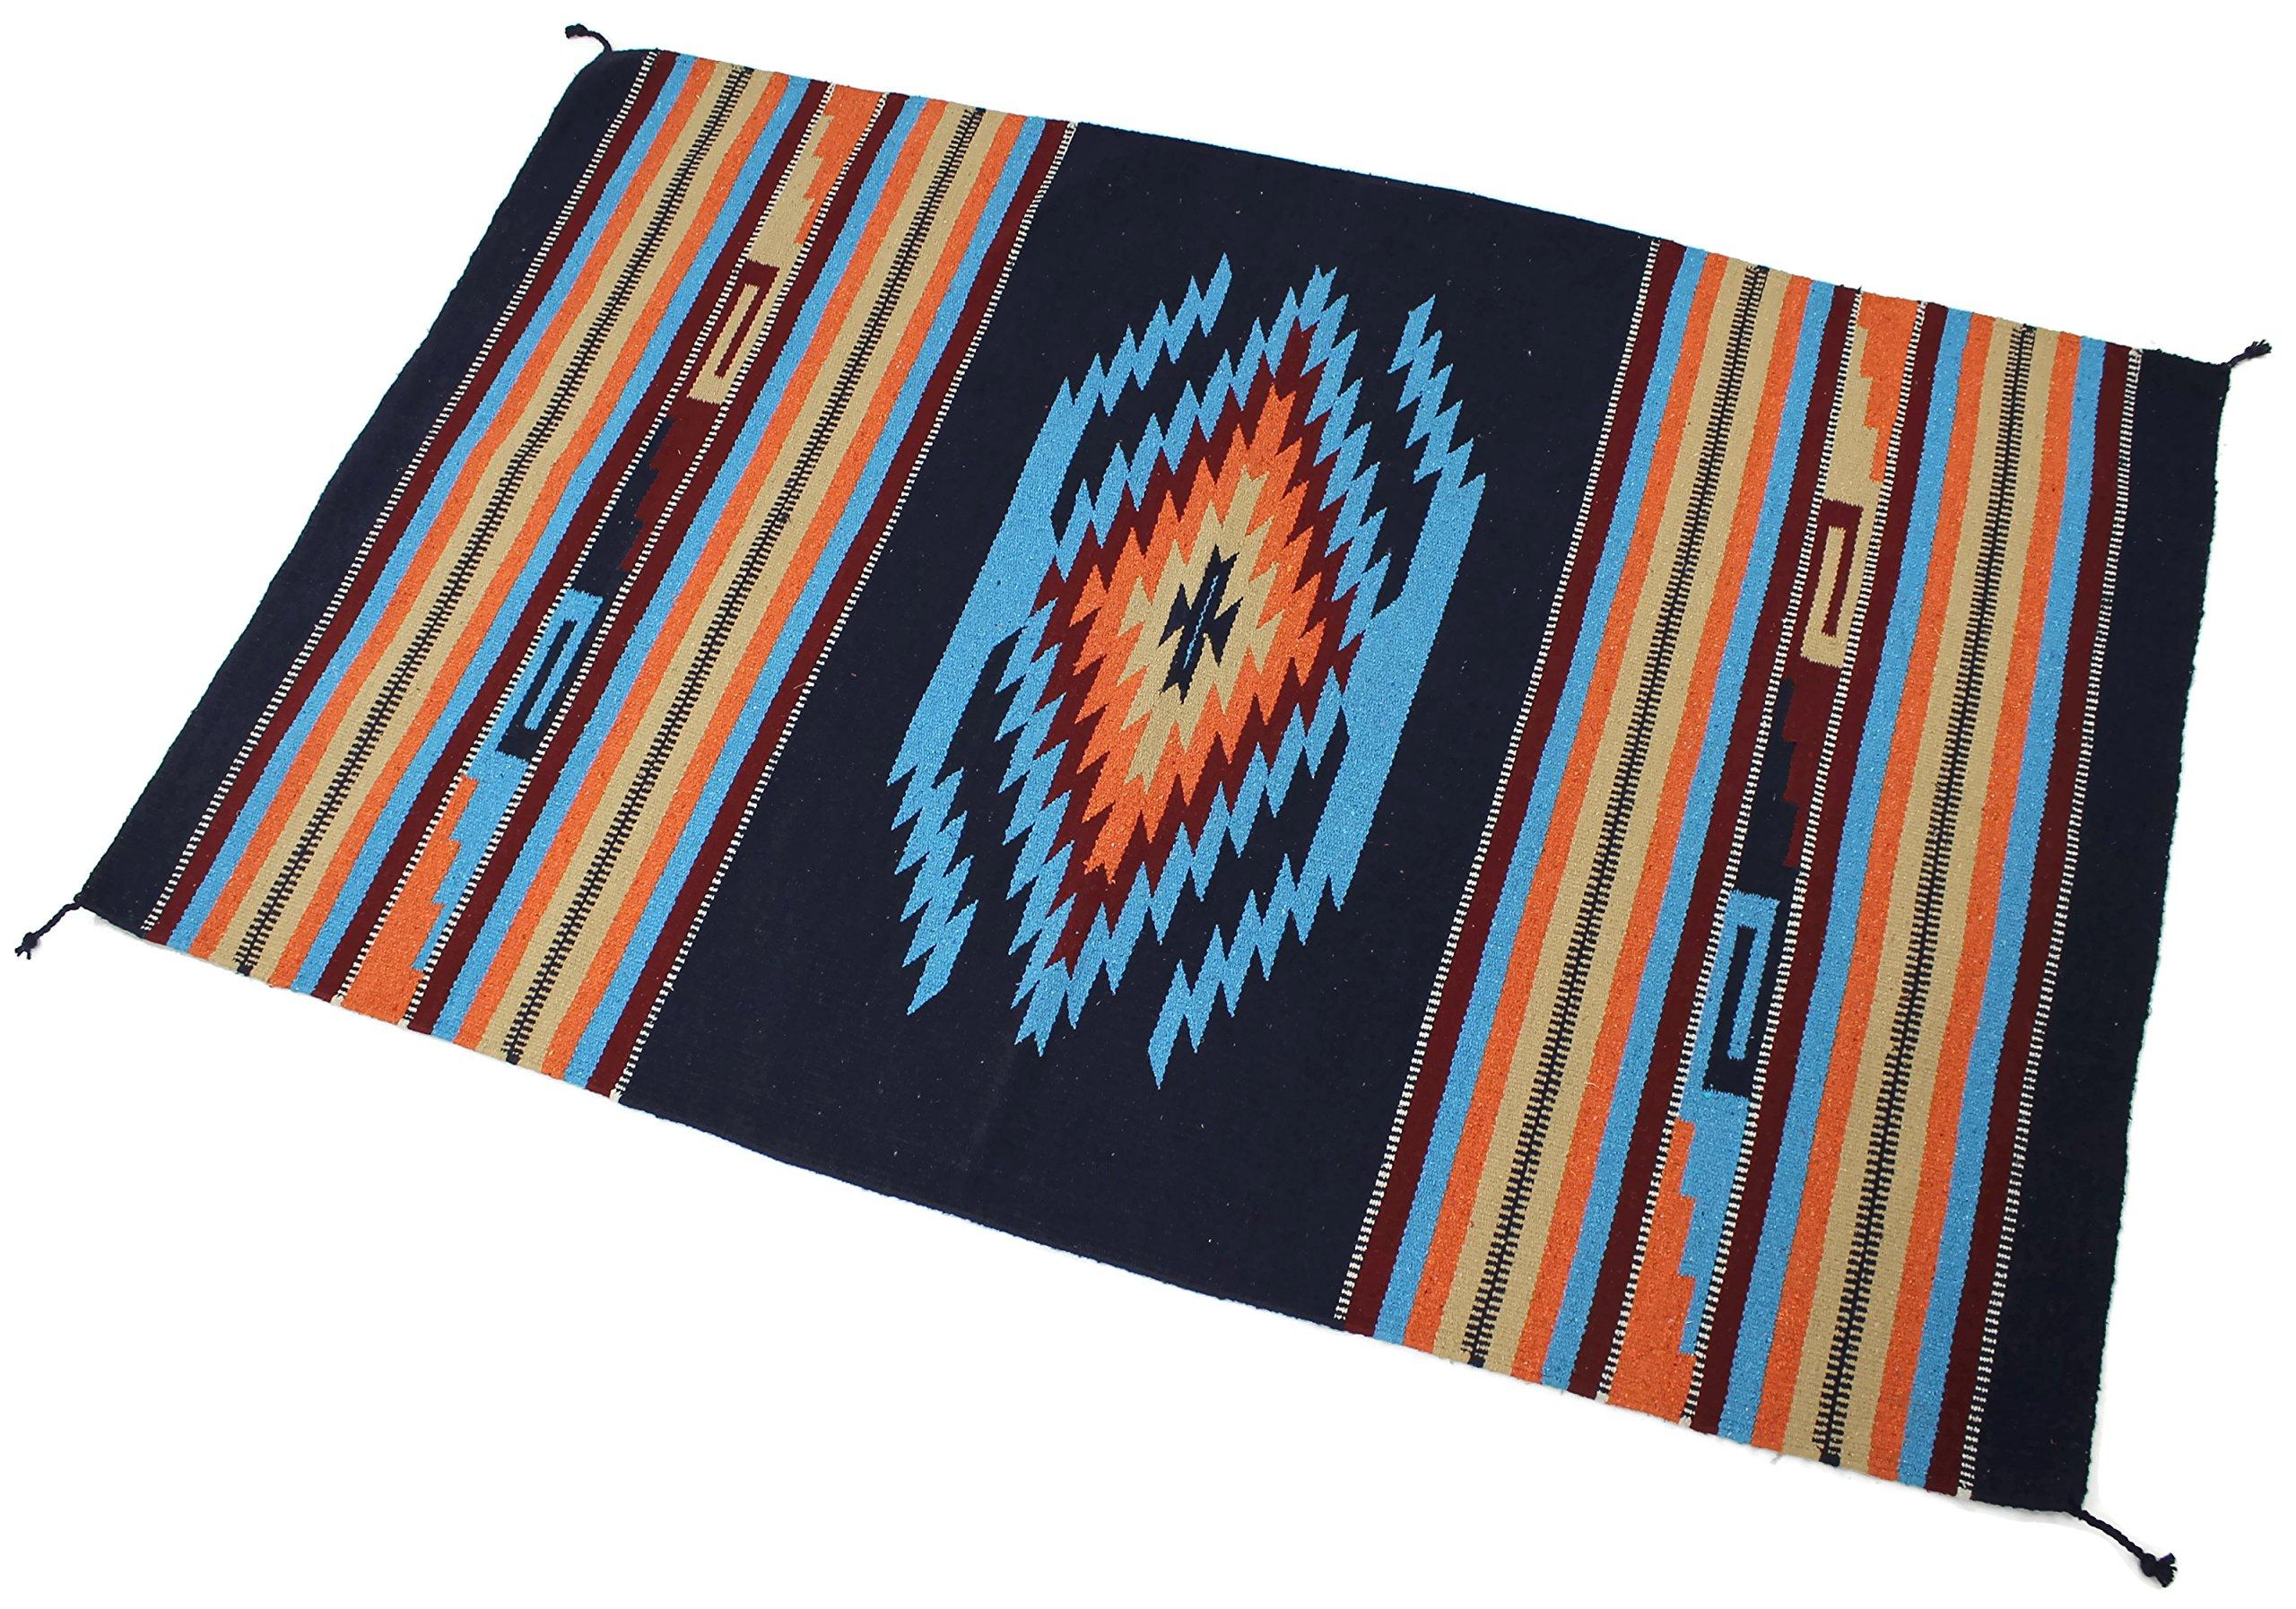 Splendid Exchange Hand Woven Acrylic Southwest Area Rug, 4 Feet by 6 Feet, Jewel Dark Blue